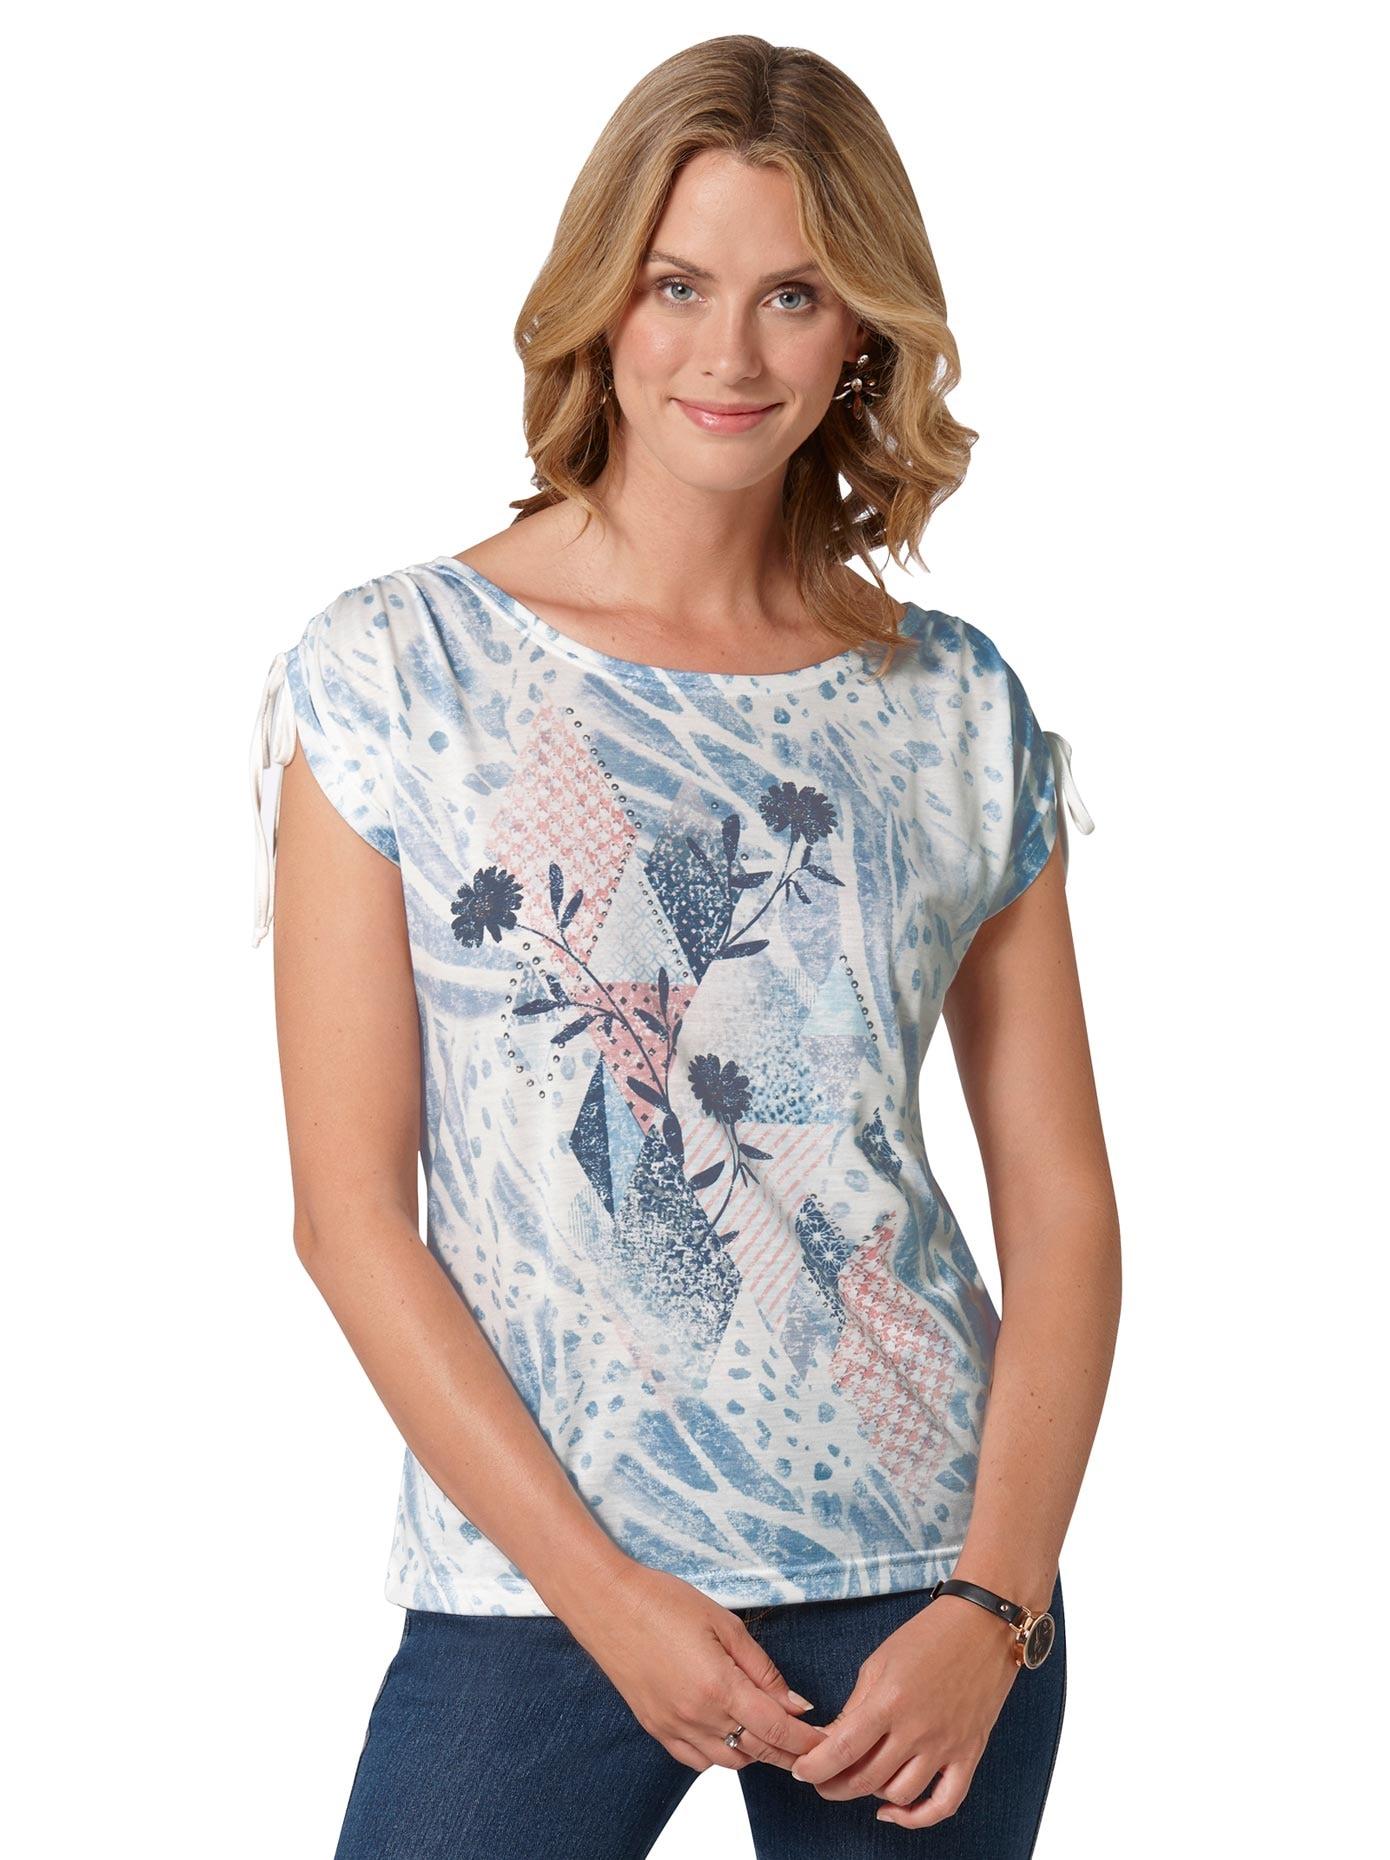 ambria shirt mit effektvollem muster angesagter Mustermix AKLBB1029524923